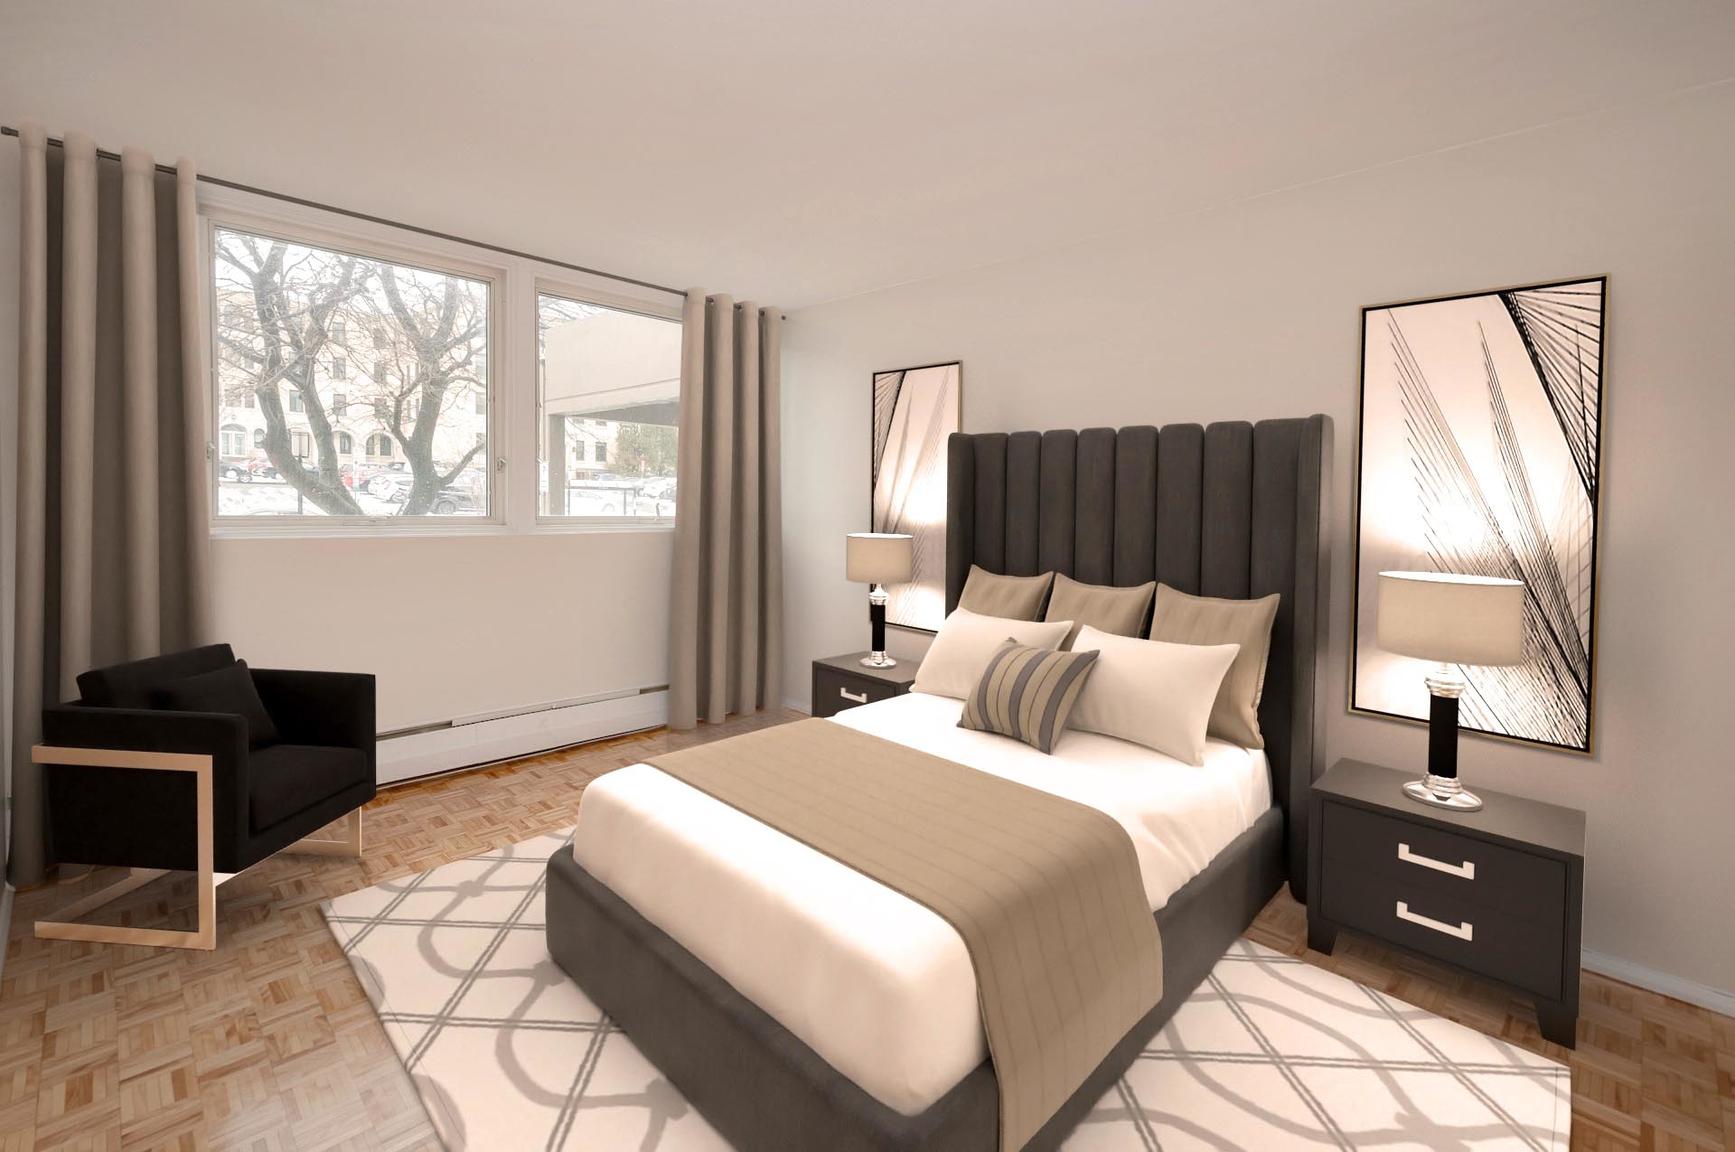 1 bedroom Apartments for rent in Quebec City at Place Samuel de Champlain - Photo 14 - RentersPages – L407129